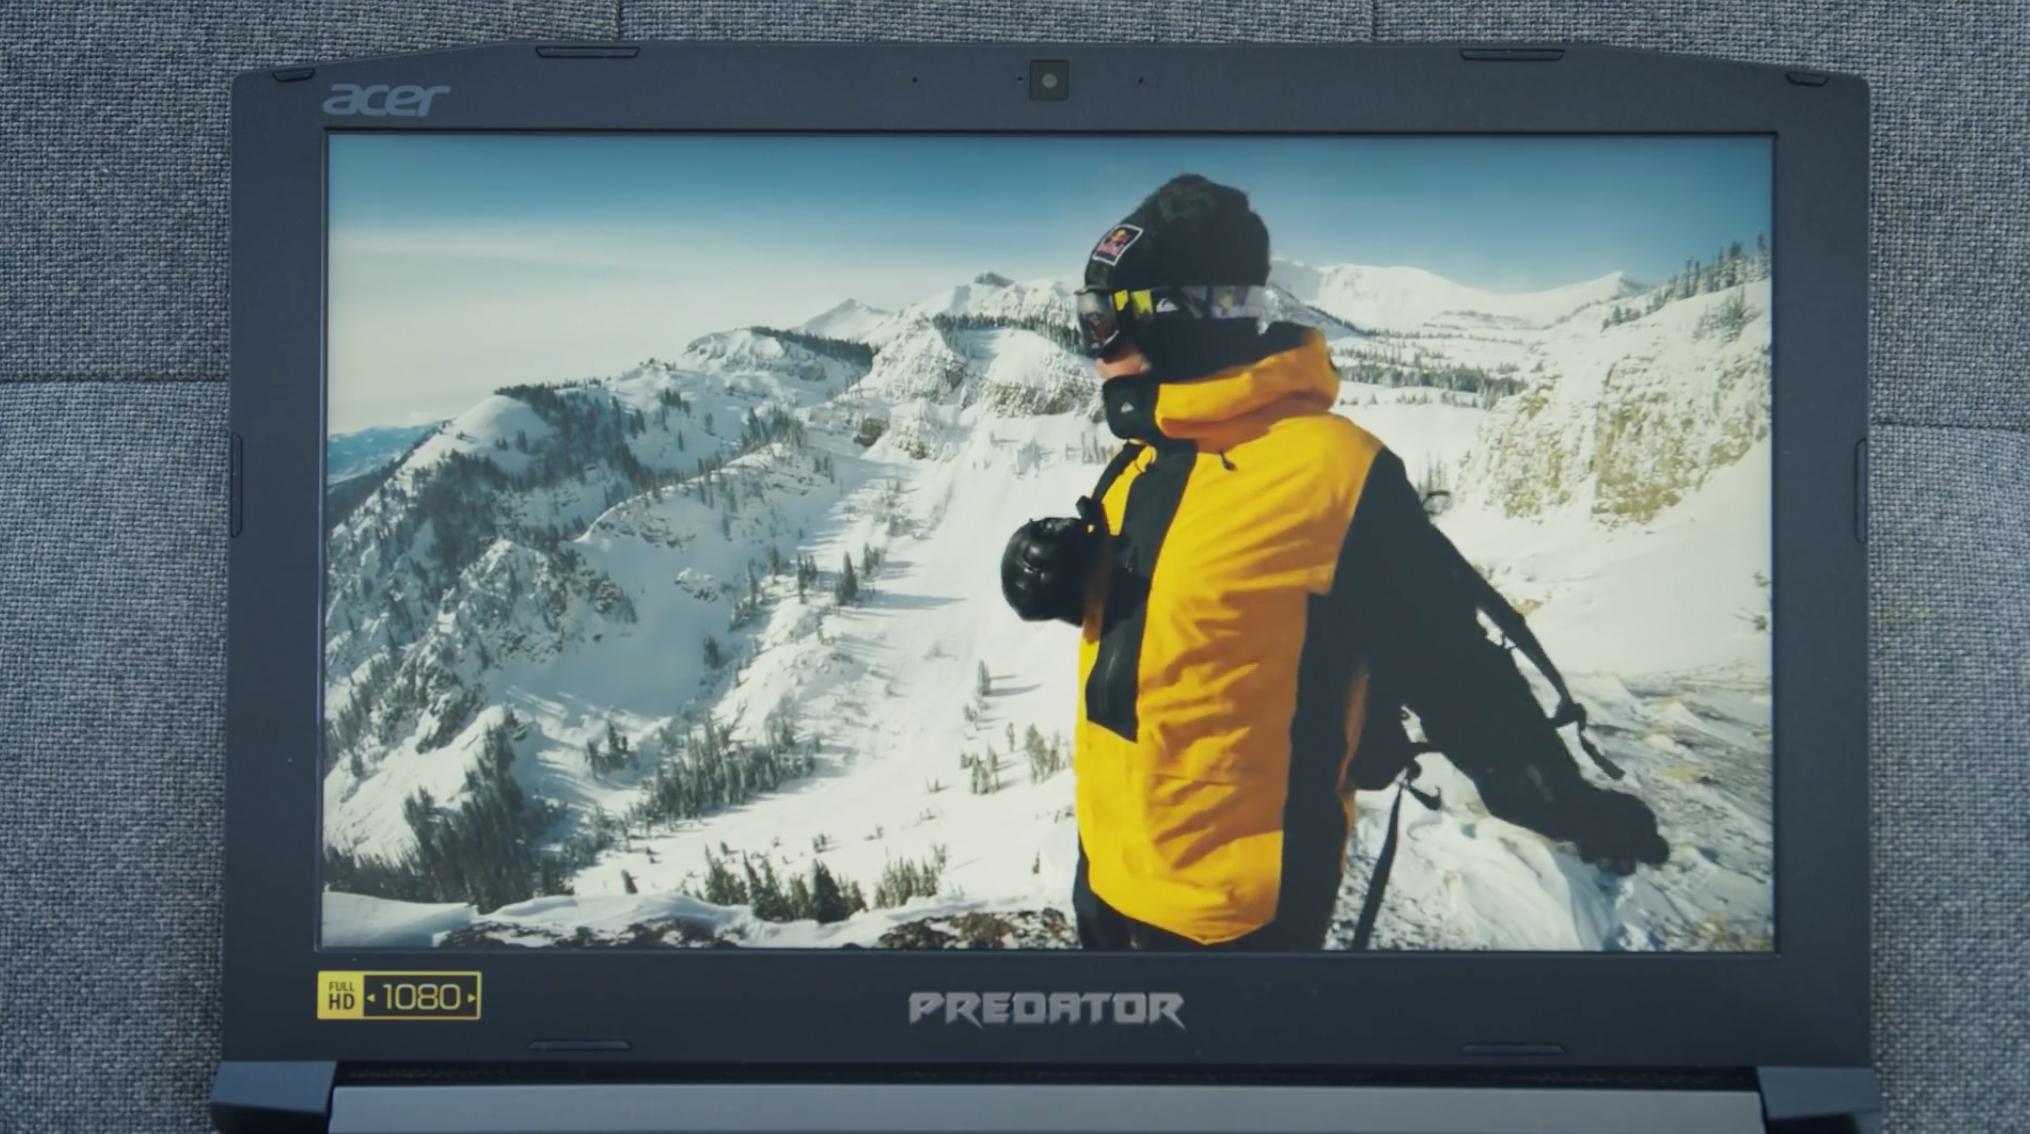 Análise Acer Predator Helio 300 G3: Tela